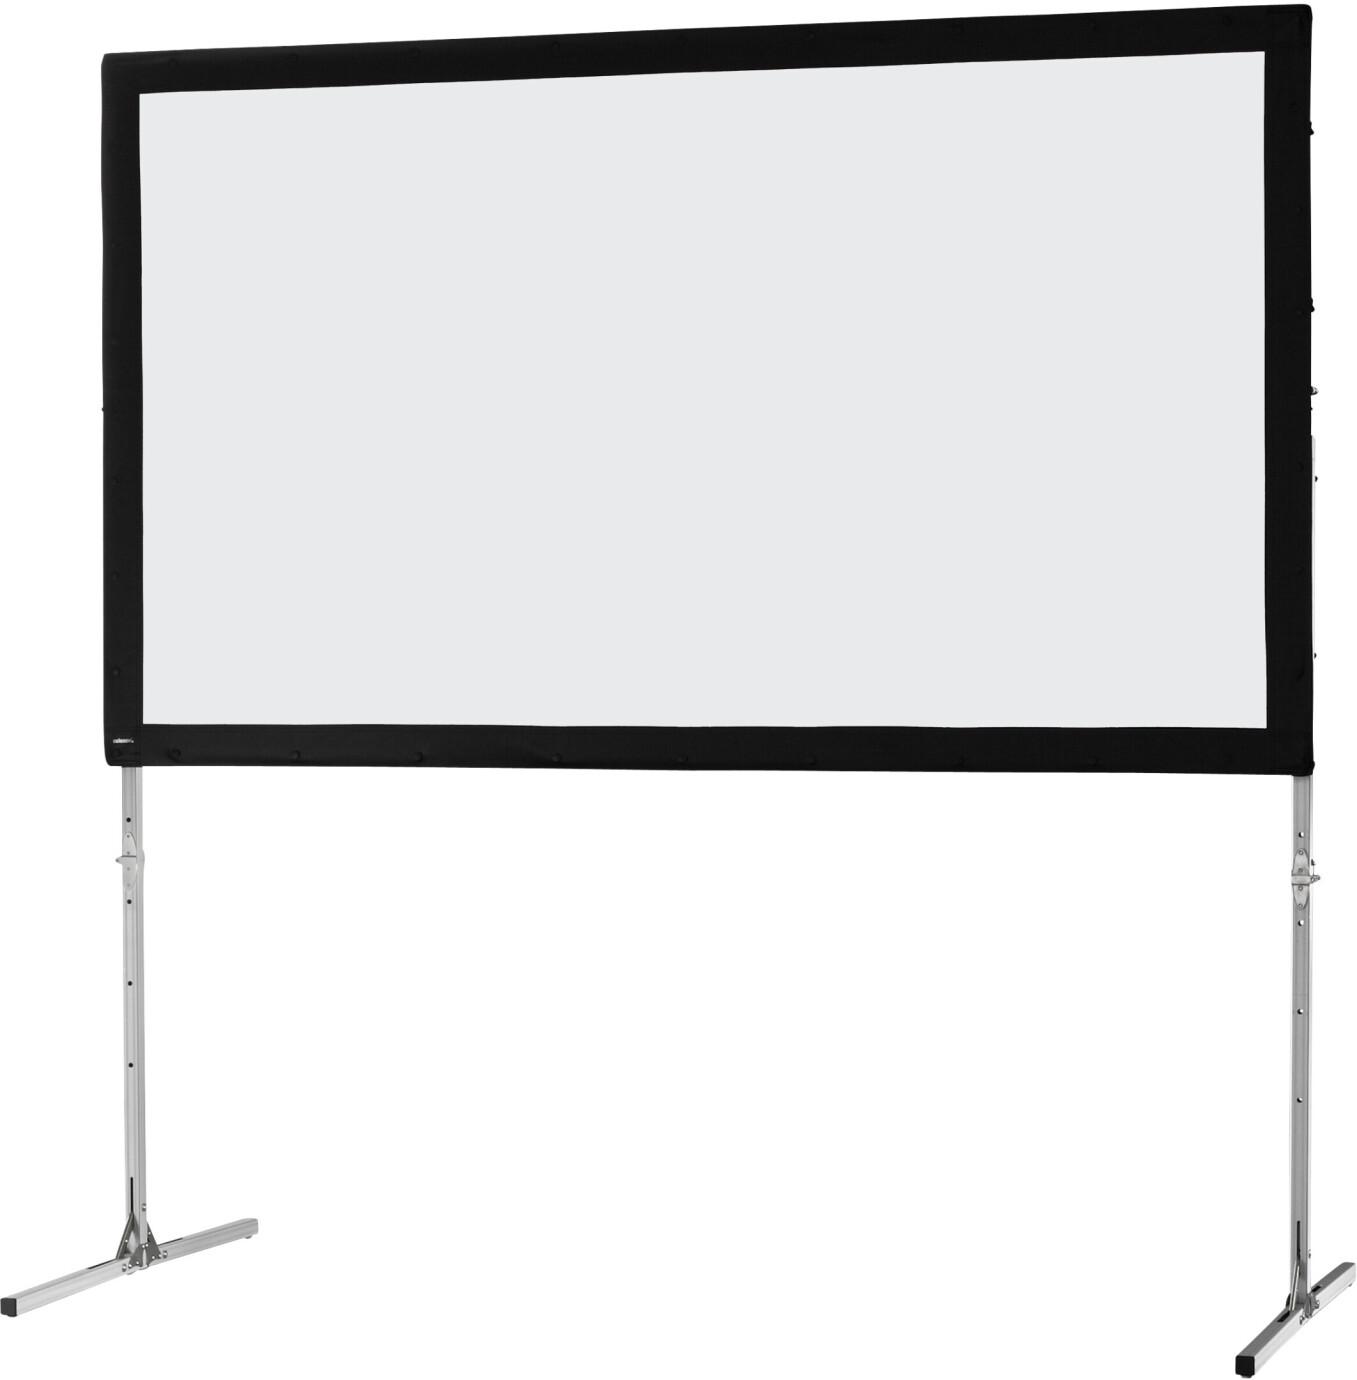 celexon Faltrahmen Leinwand Mobil Expert 305 x 172cm, Frontprojektion